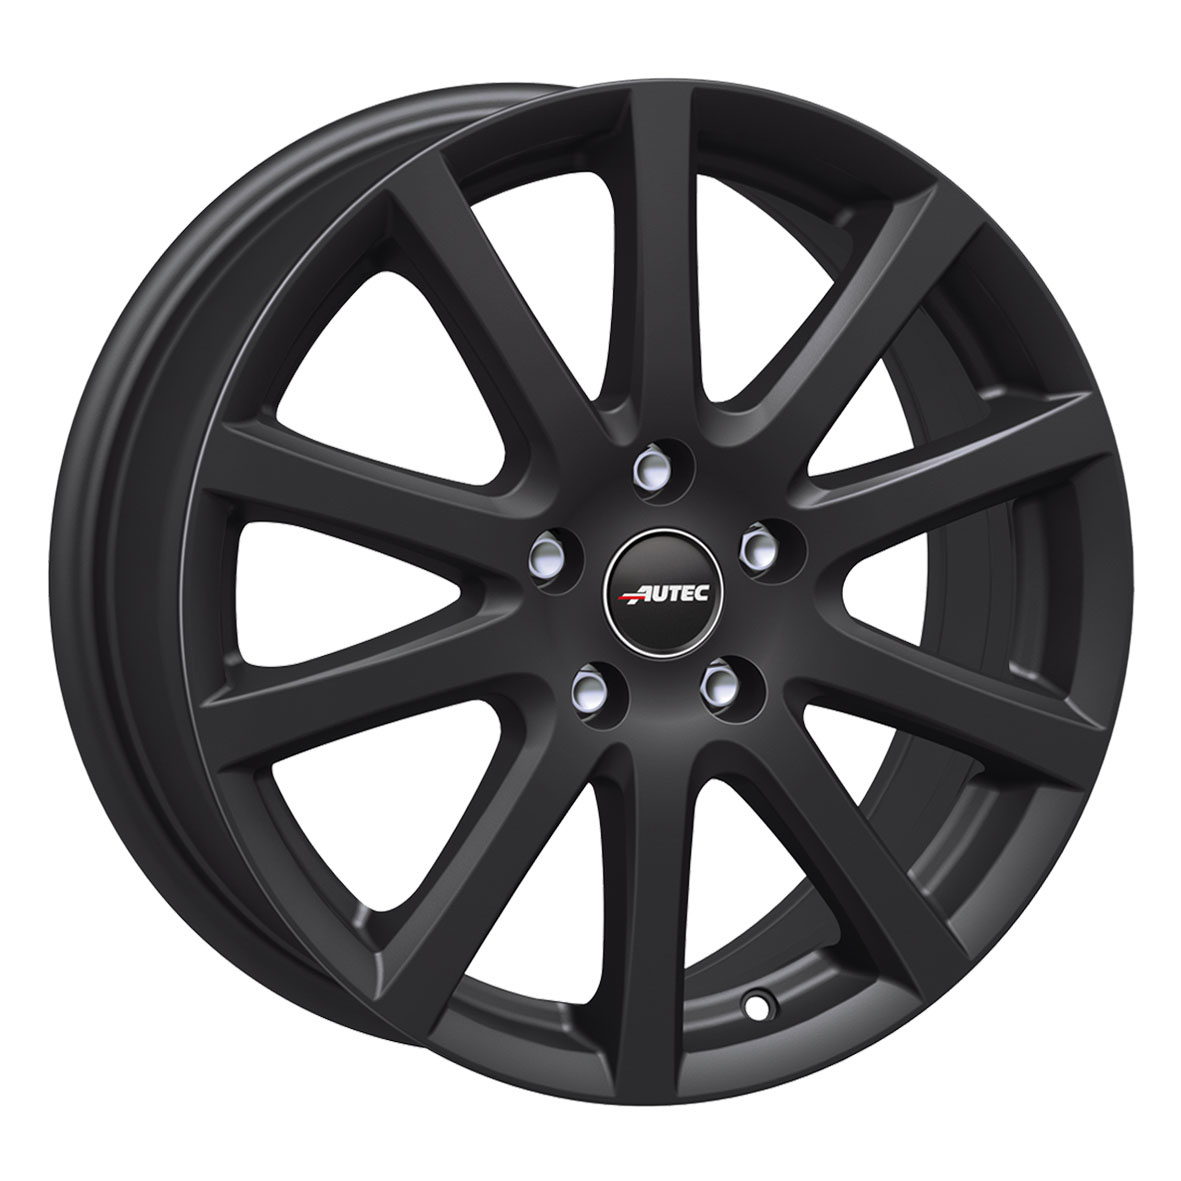 "Autec Wheels Autec  ""SKANDIC"" 6 x 15 - 8 x 19  Audi , Chevrolet , Citroen , Dacia , Honda , Hyundai , Kia , Mazda , MB , Mini ,"